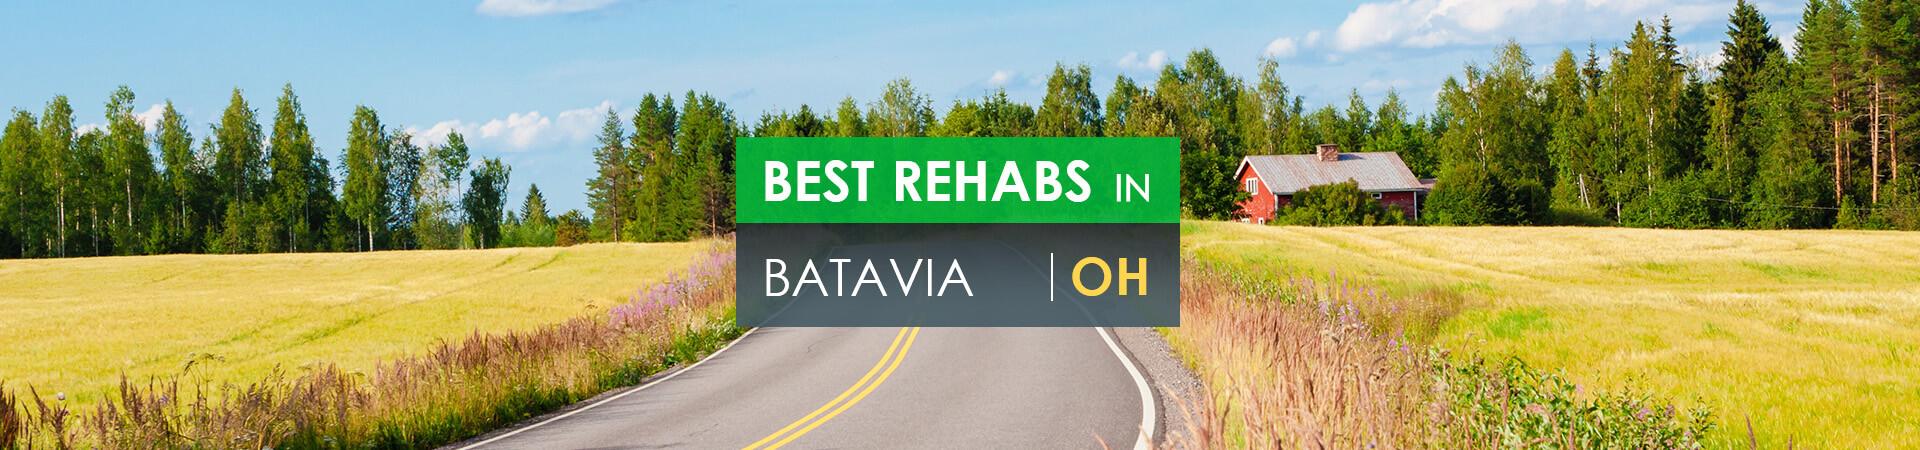 Best rehabs in Batavia, OH